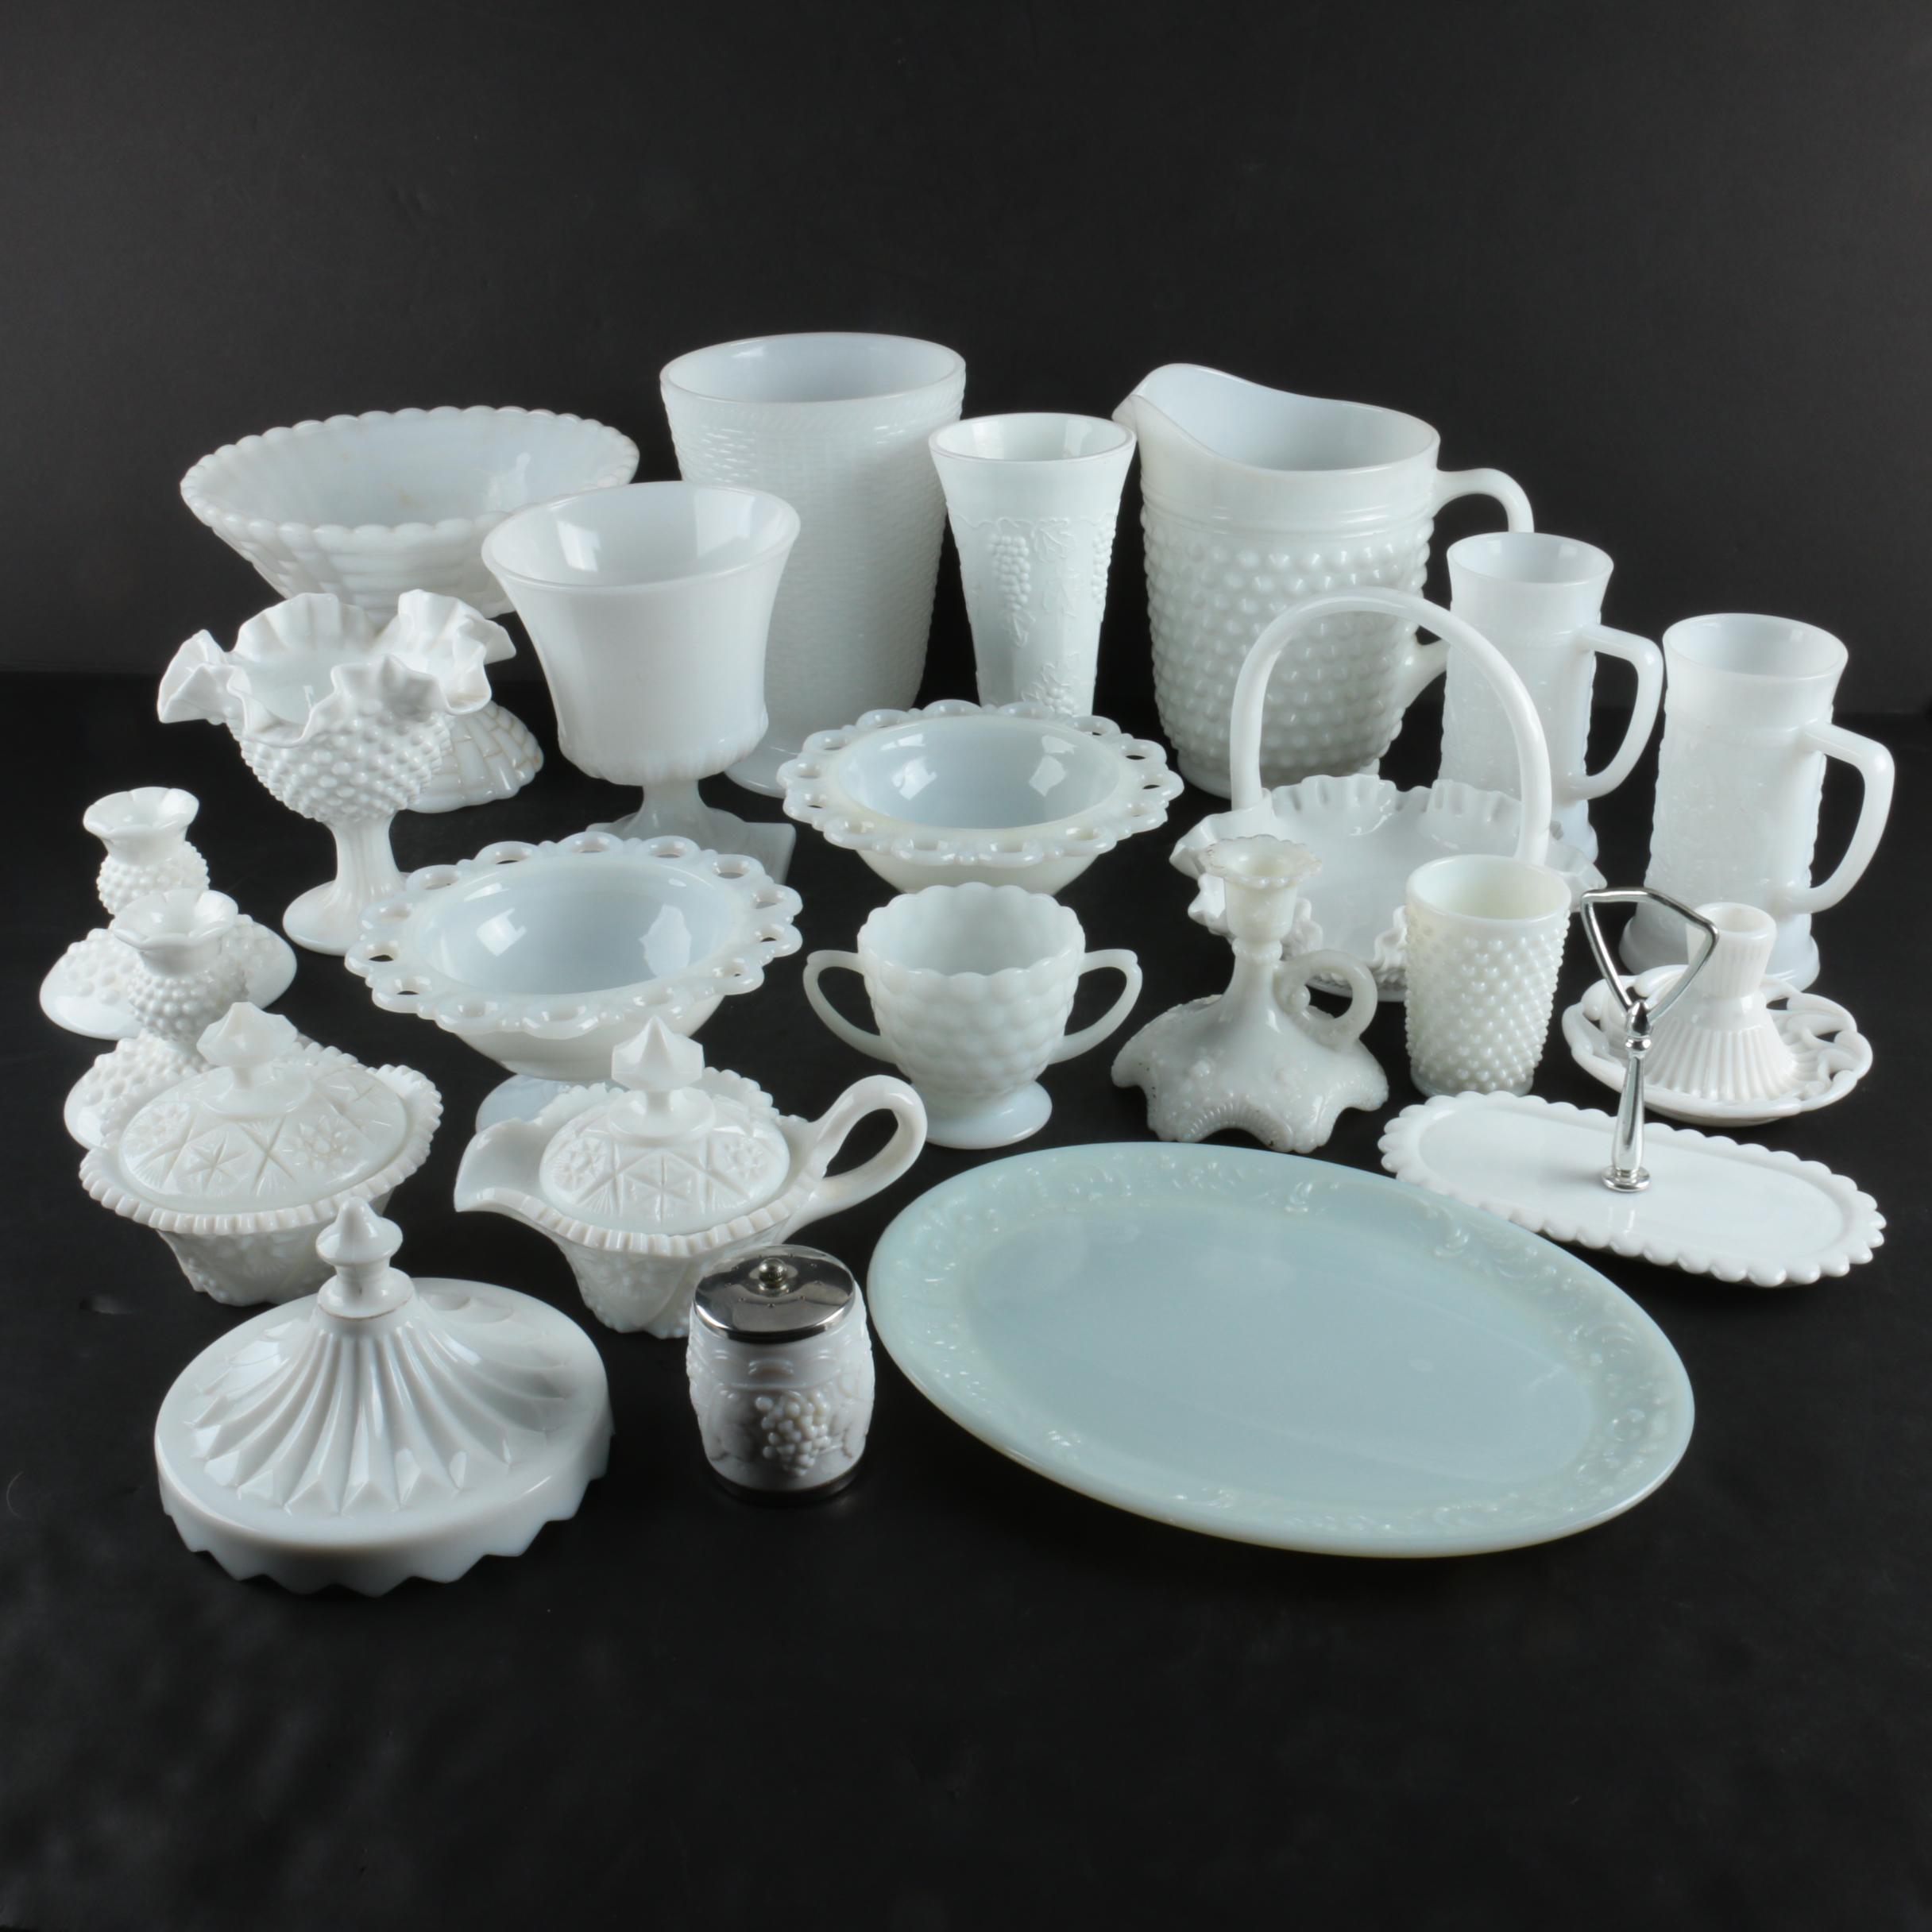 Vintage Milk Glass Tableware Featuring Fenton Hobnail